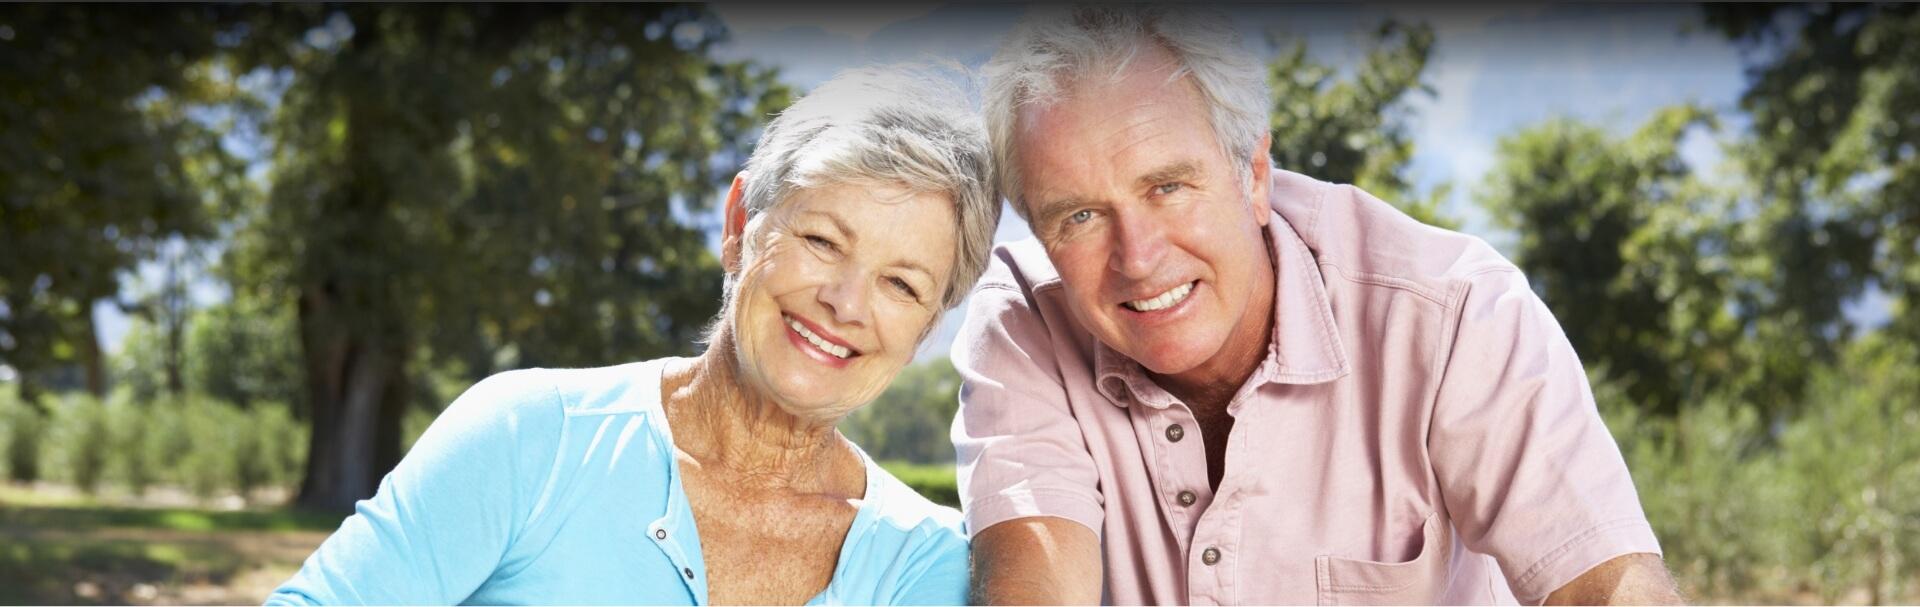 Happy senior couple after having dental implant treatment